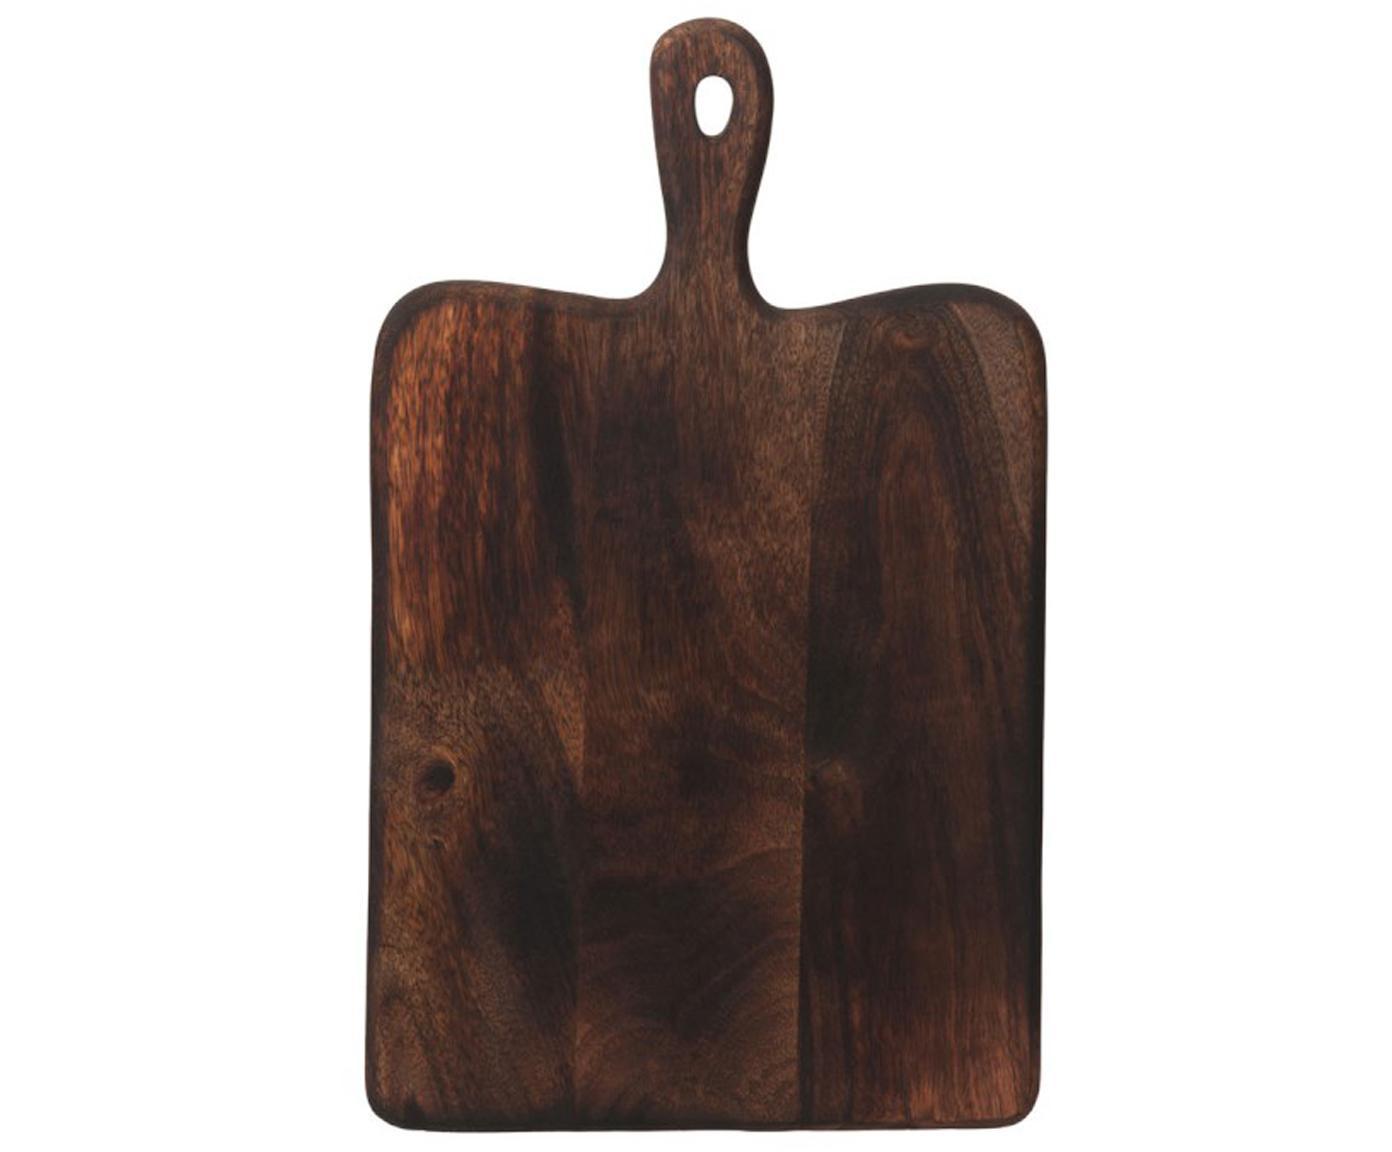 Deska do krojenia Branek, Drewno naturalne, Ciemny brązowy, S 40 x W 1 cm